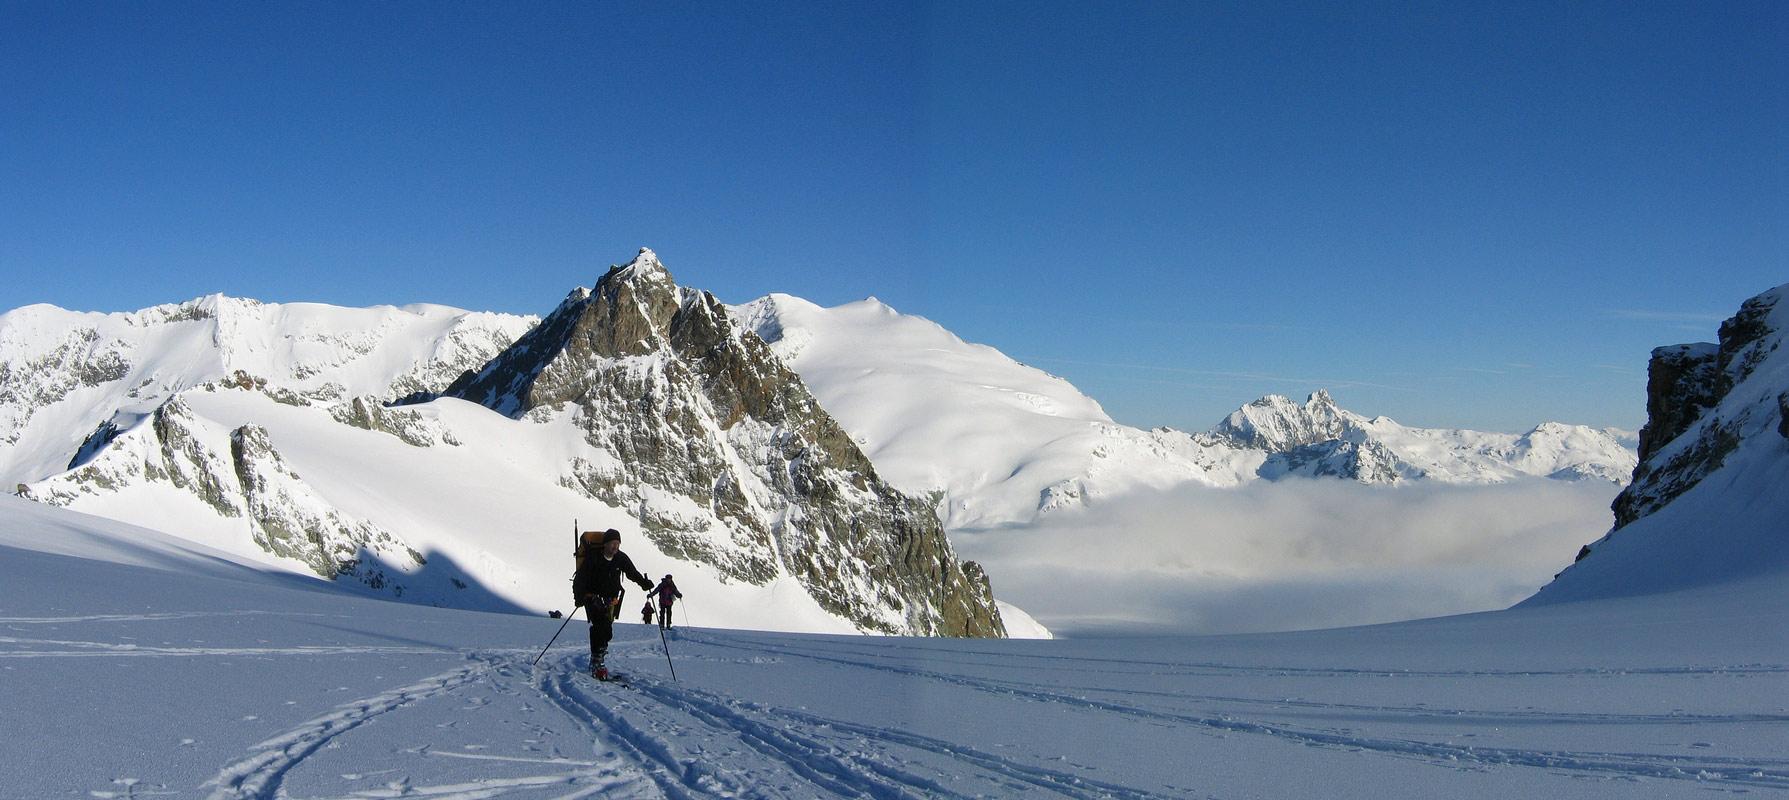 Col Valpelline, Day 6 H.R. Chamonix-Zermatt Walliser Alpen / Alpes valaisannes Švýcarsko panorama 25